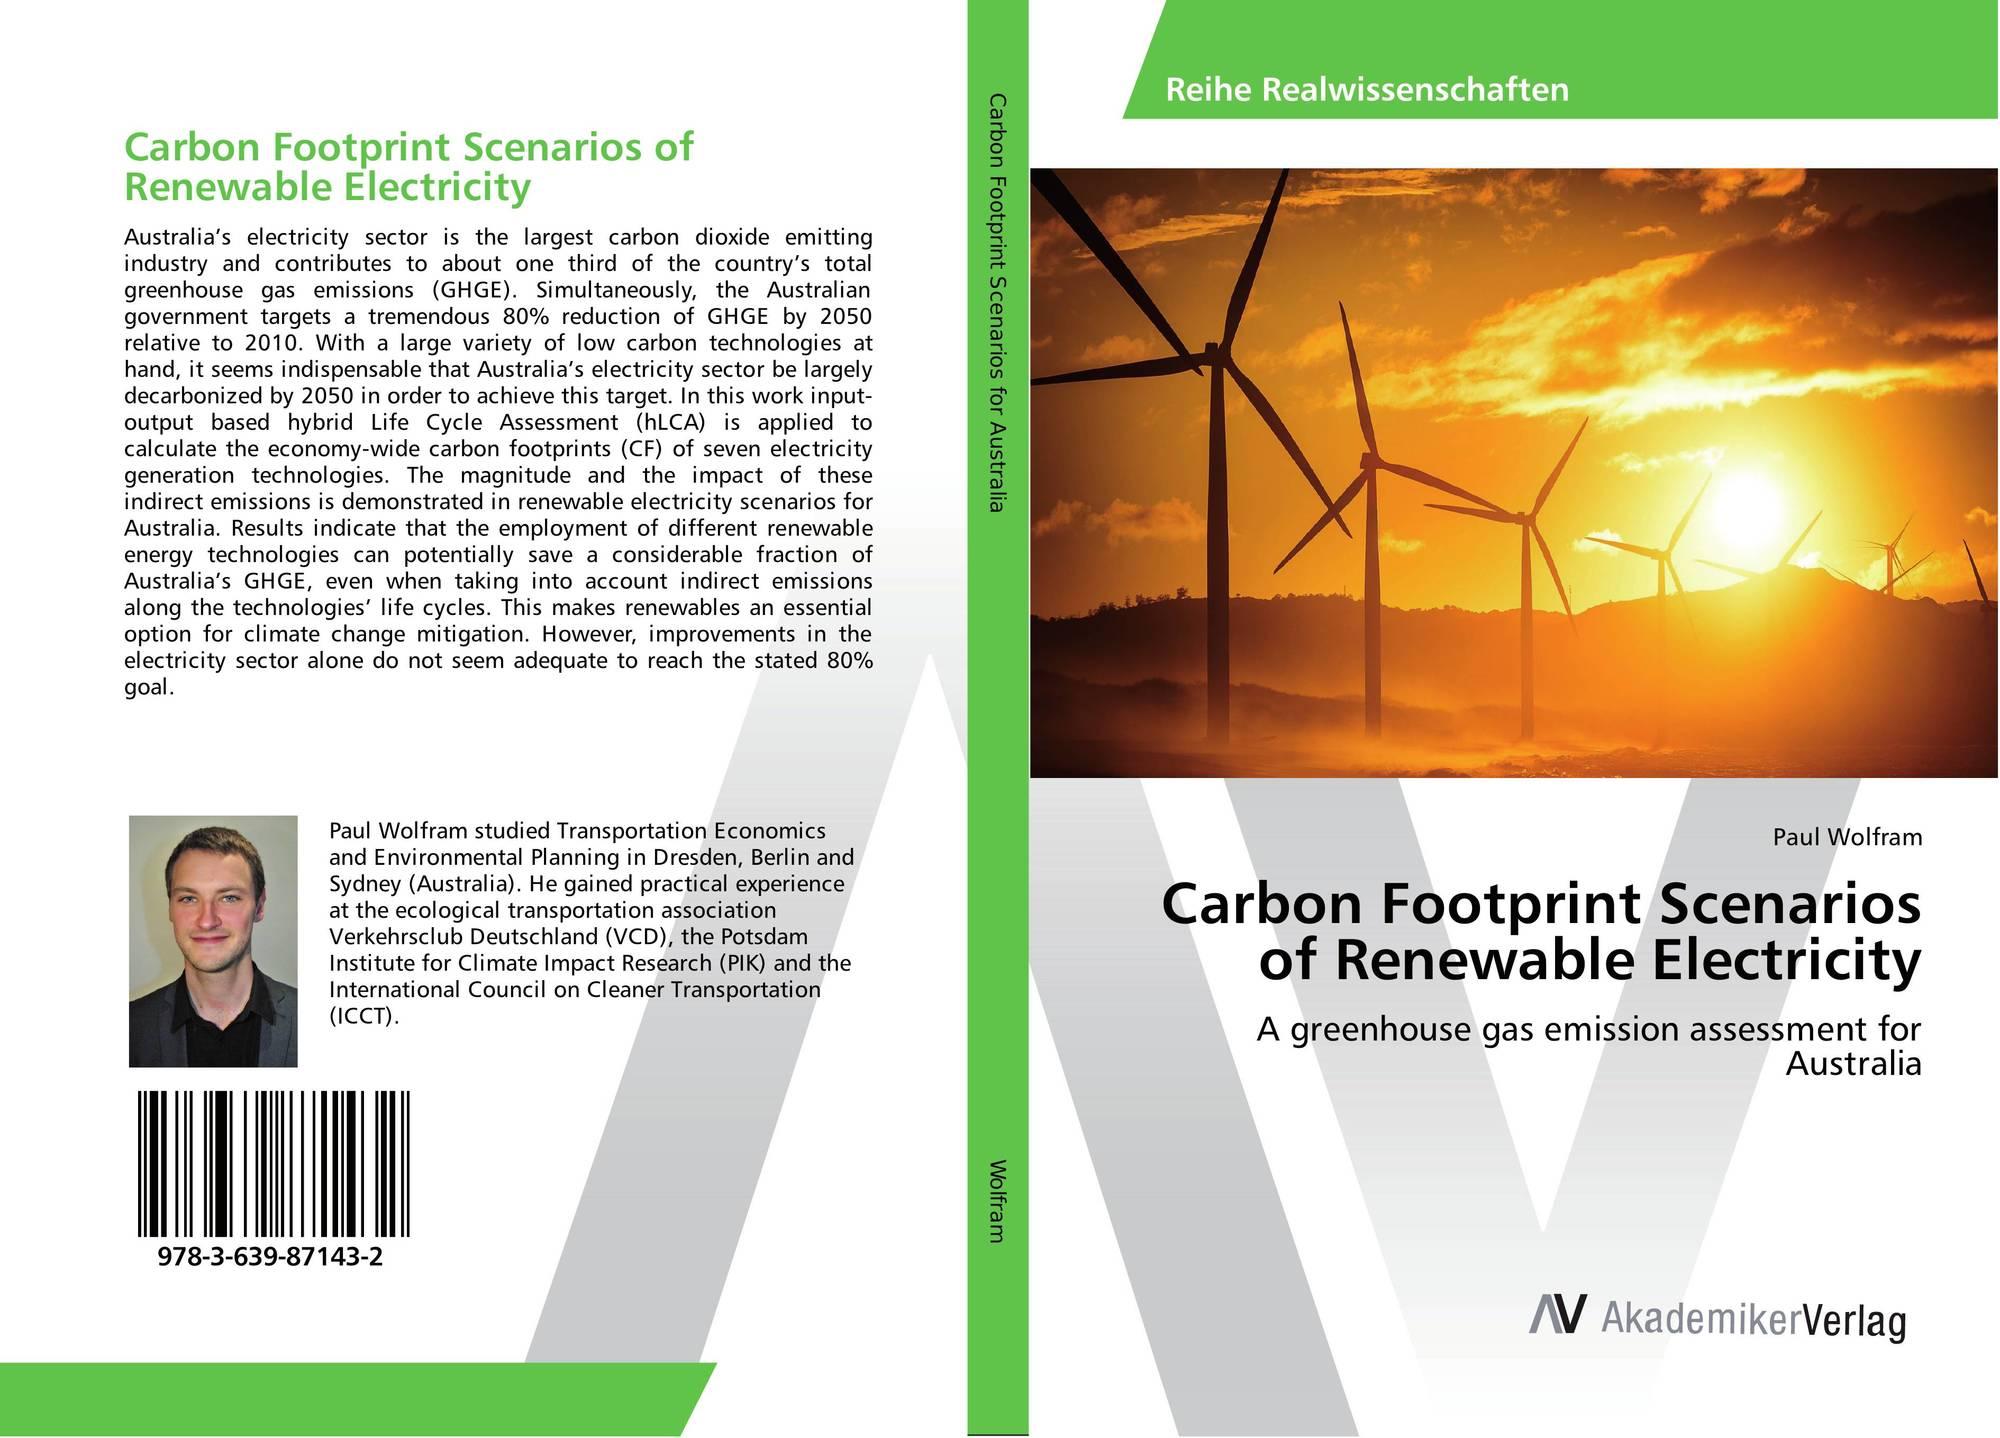 Carbon Footprint Scenarios Of Renewable